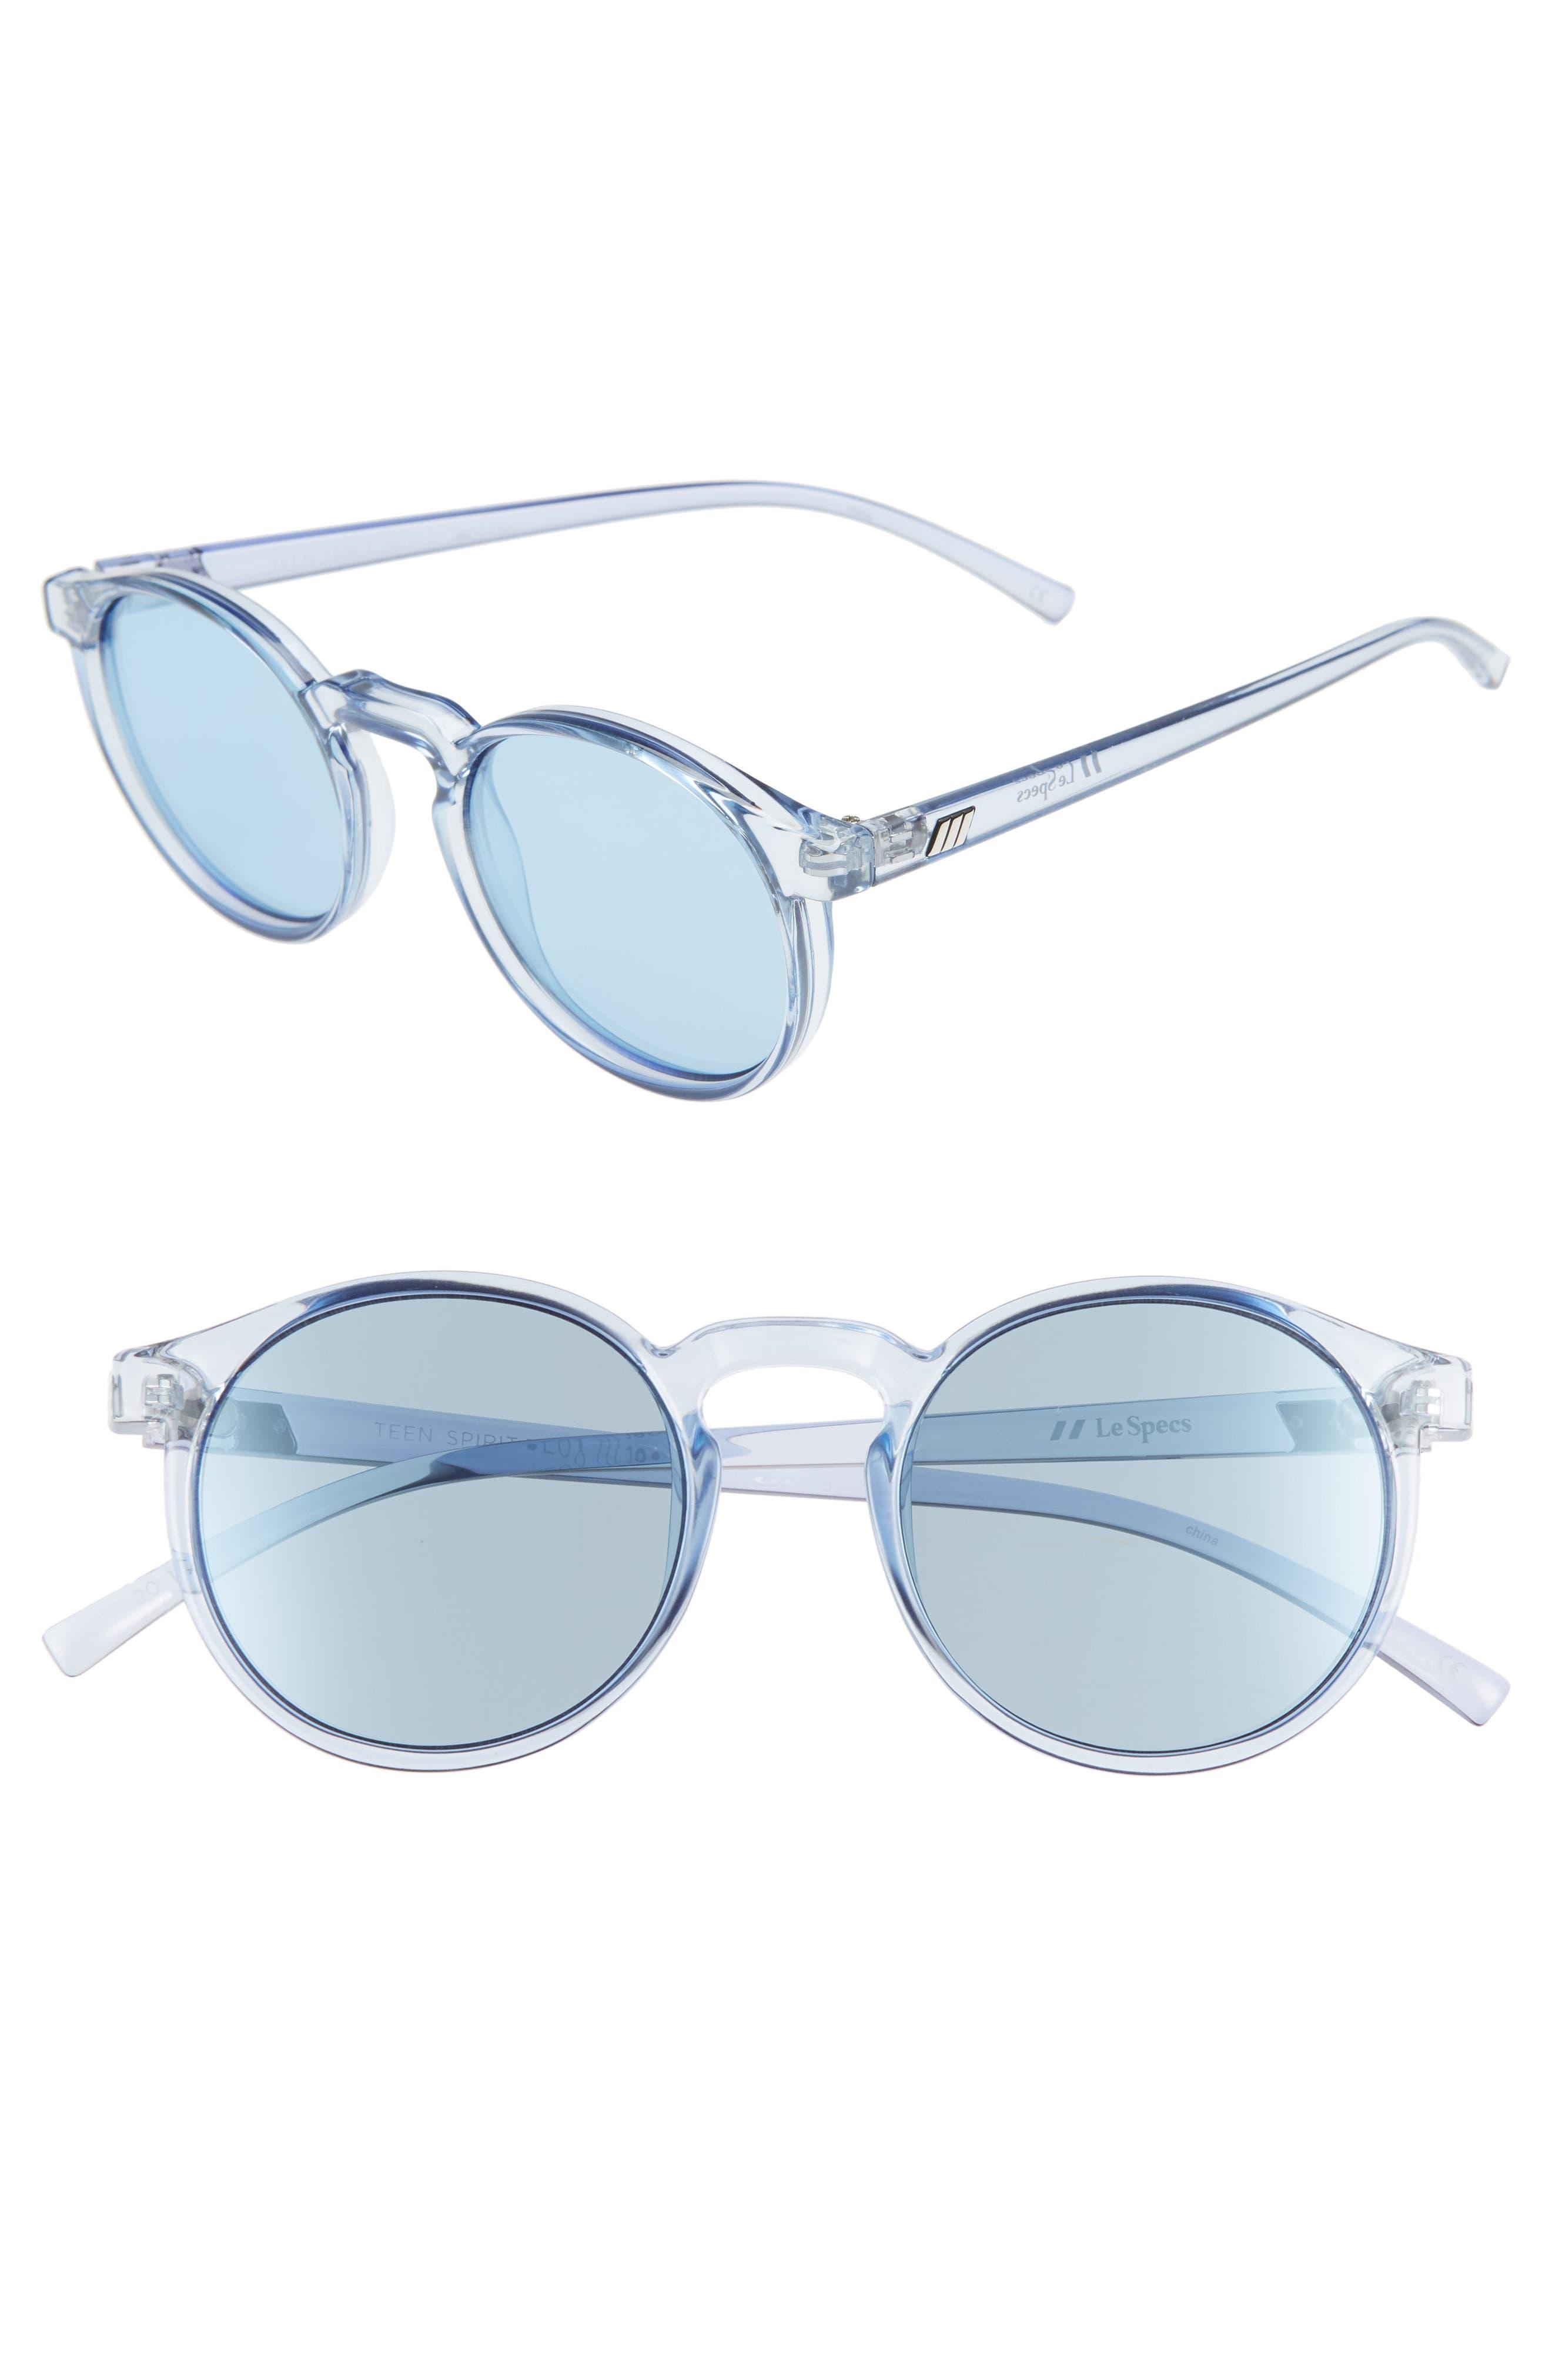 Le Specs Teen Spirit Deaux 50Mm Round Sunglasses - Chambray